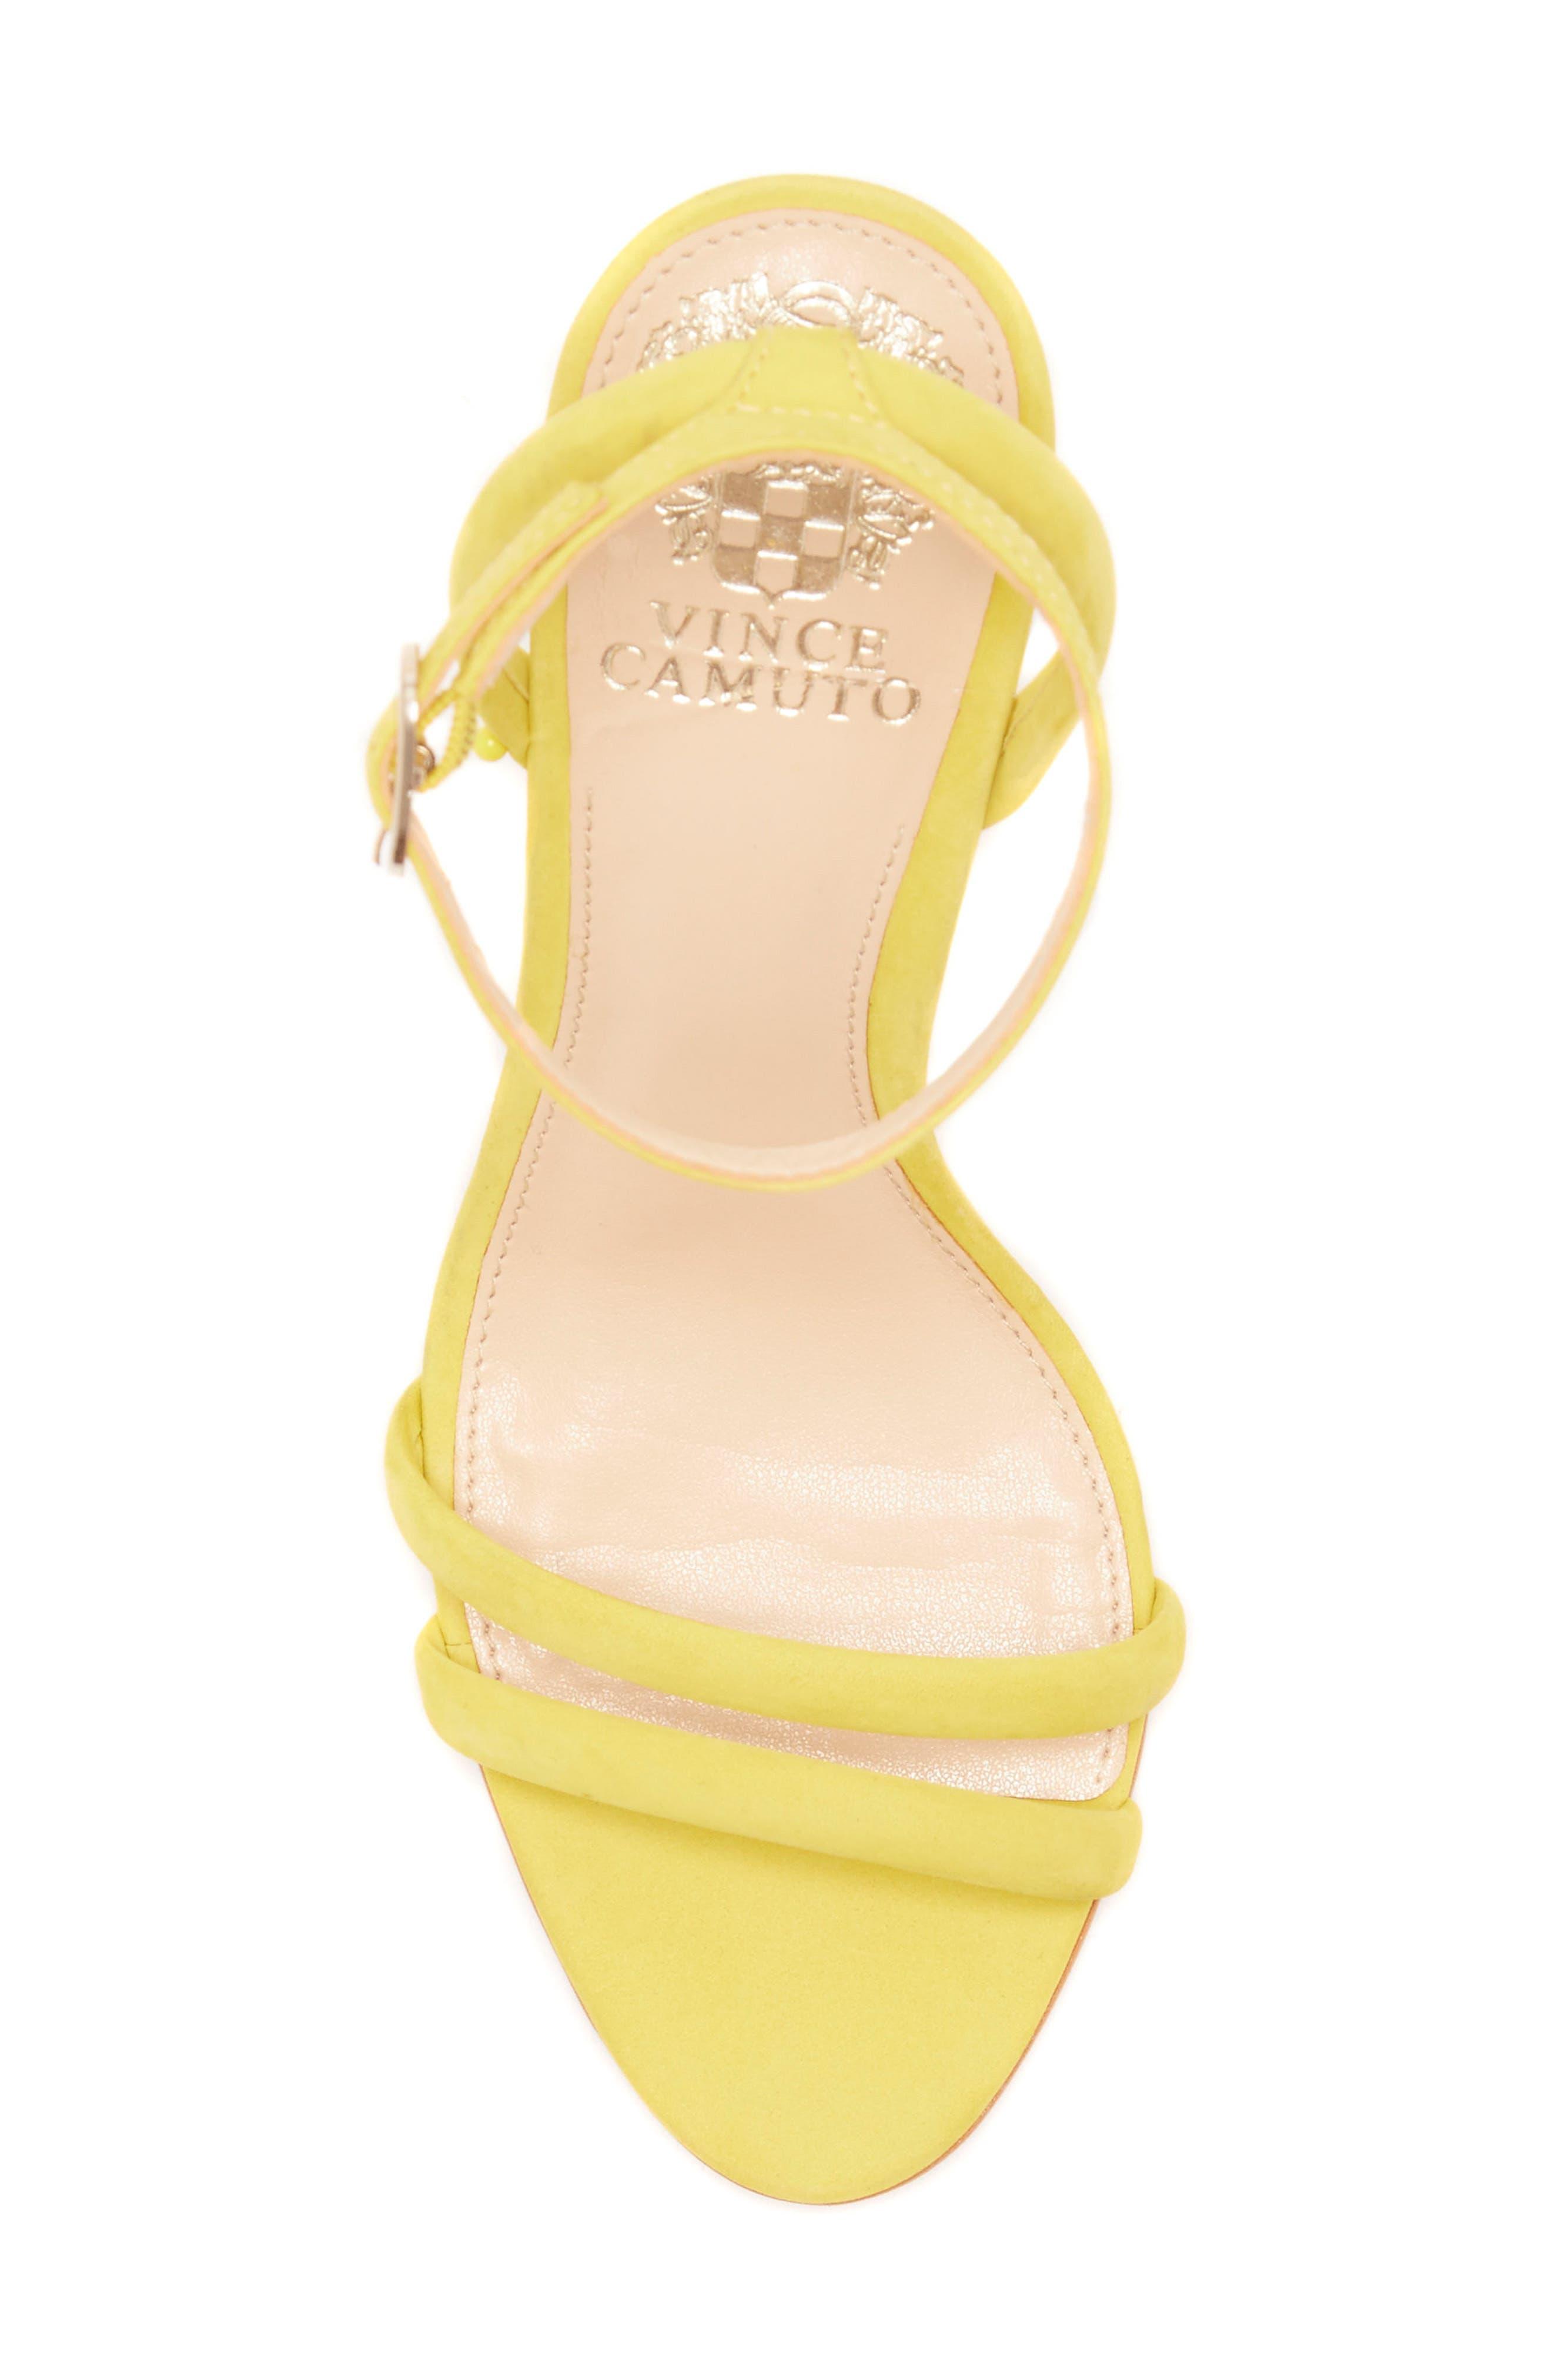 Kareenat Sandal,                             Alternate thumbnail 5, color,                             Yellow Nubuck Leather